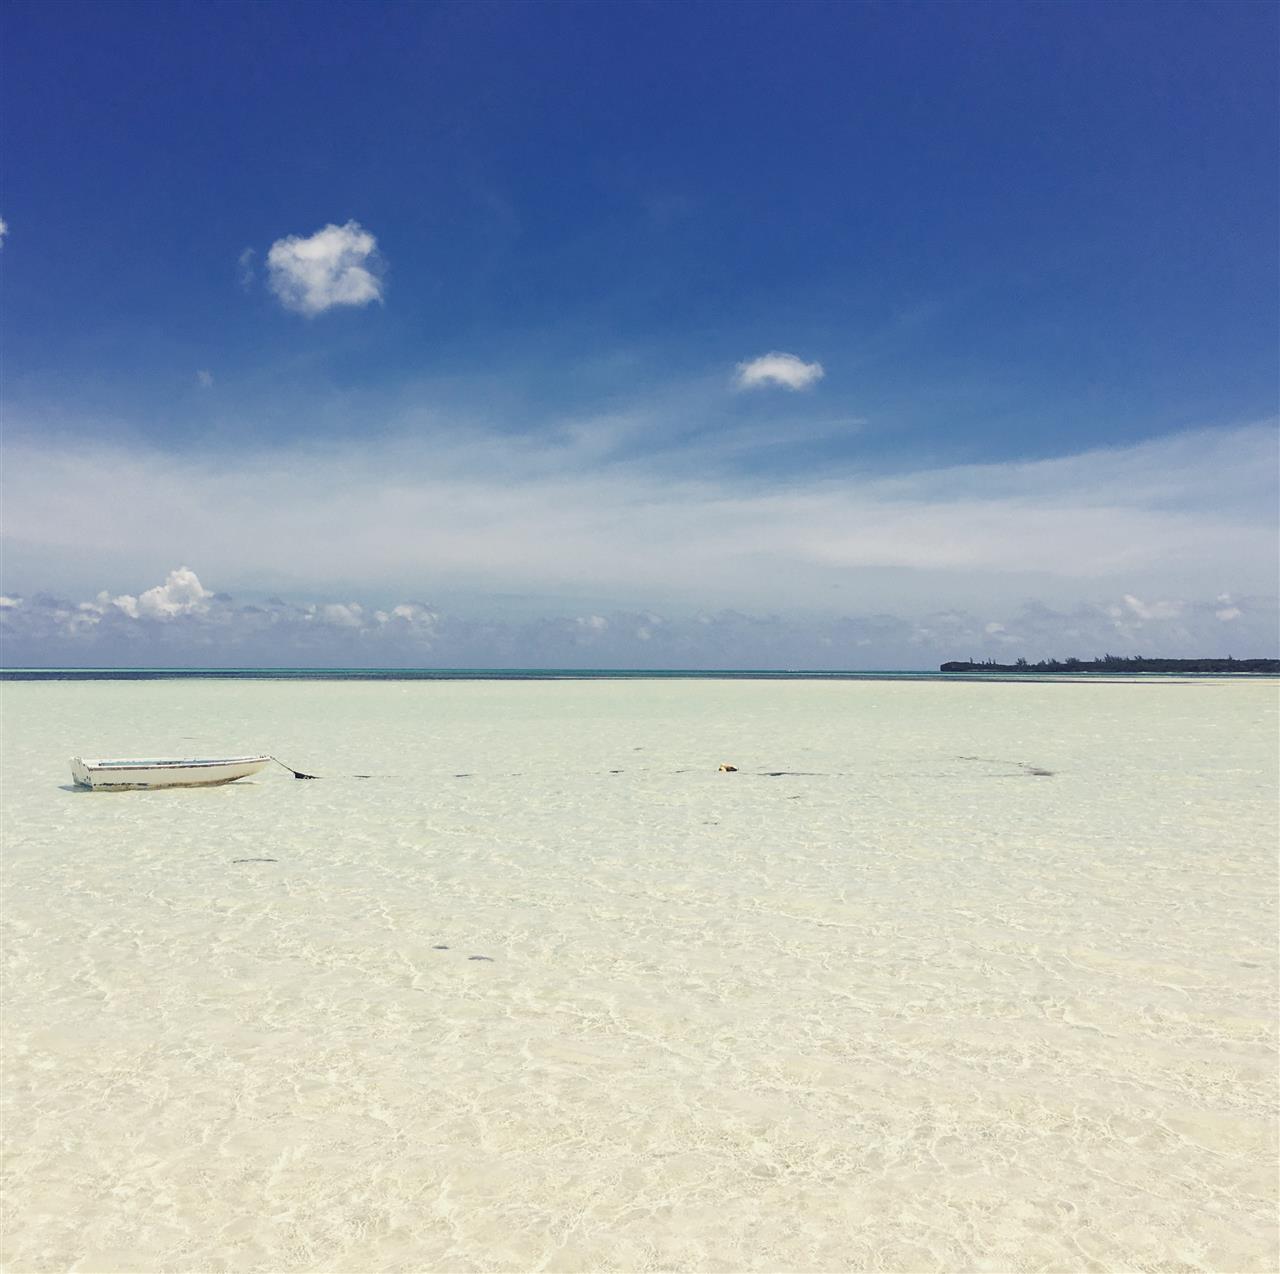 Island of Eleuthera in the Bahamas